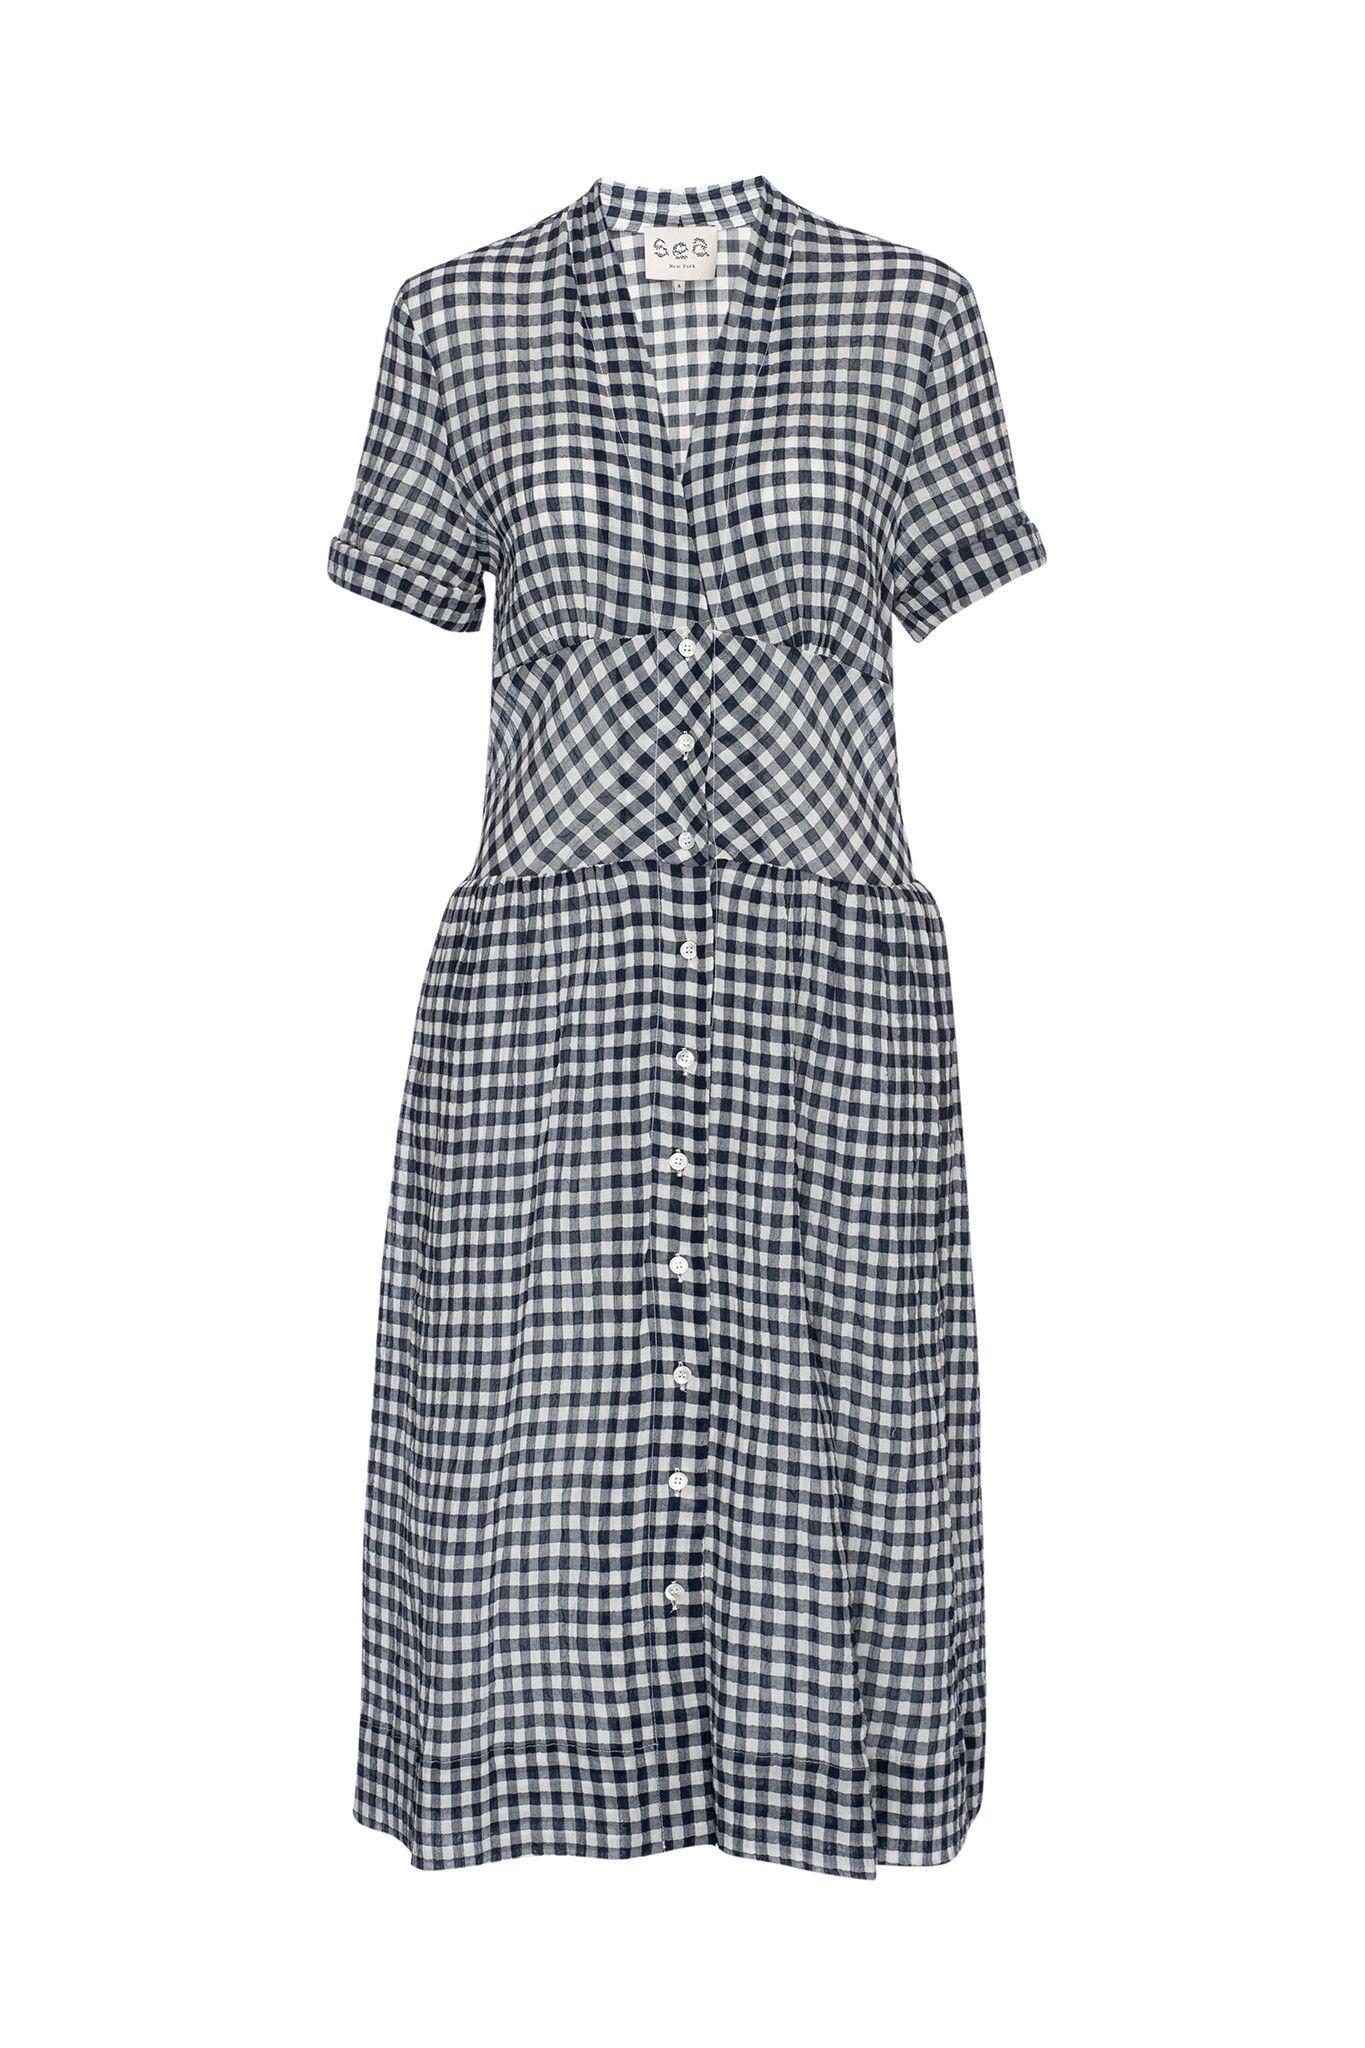 Sea NY Gingham Buttondown Dress